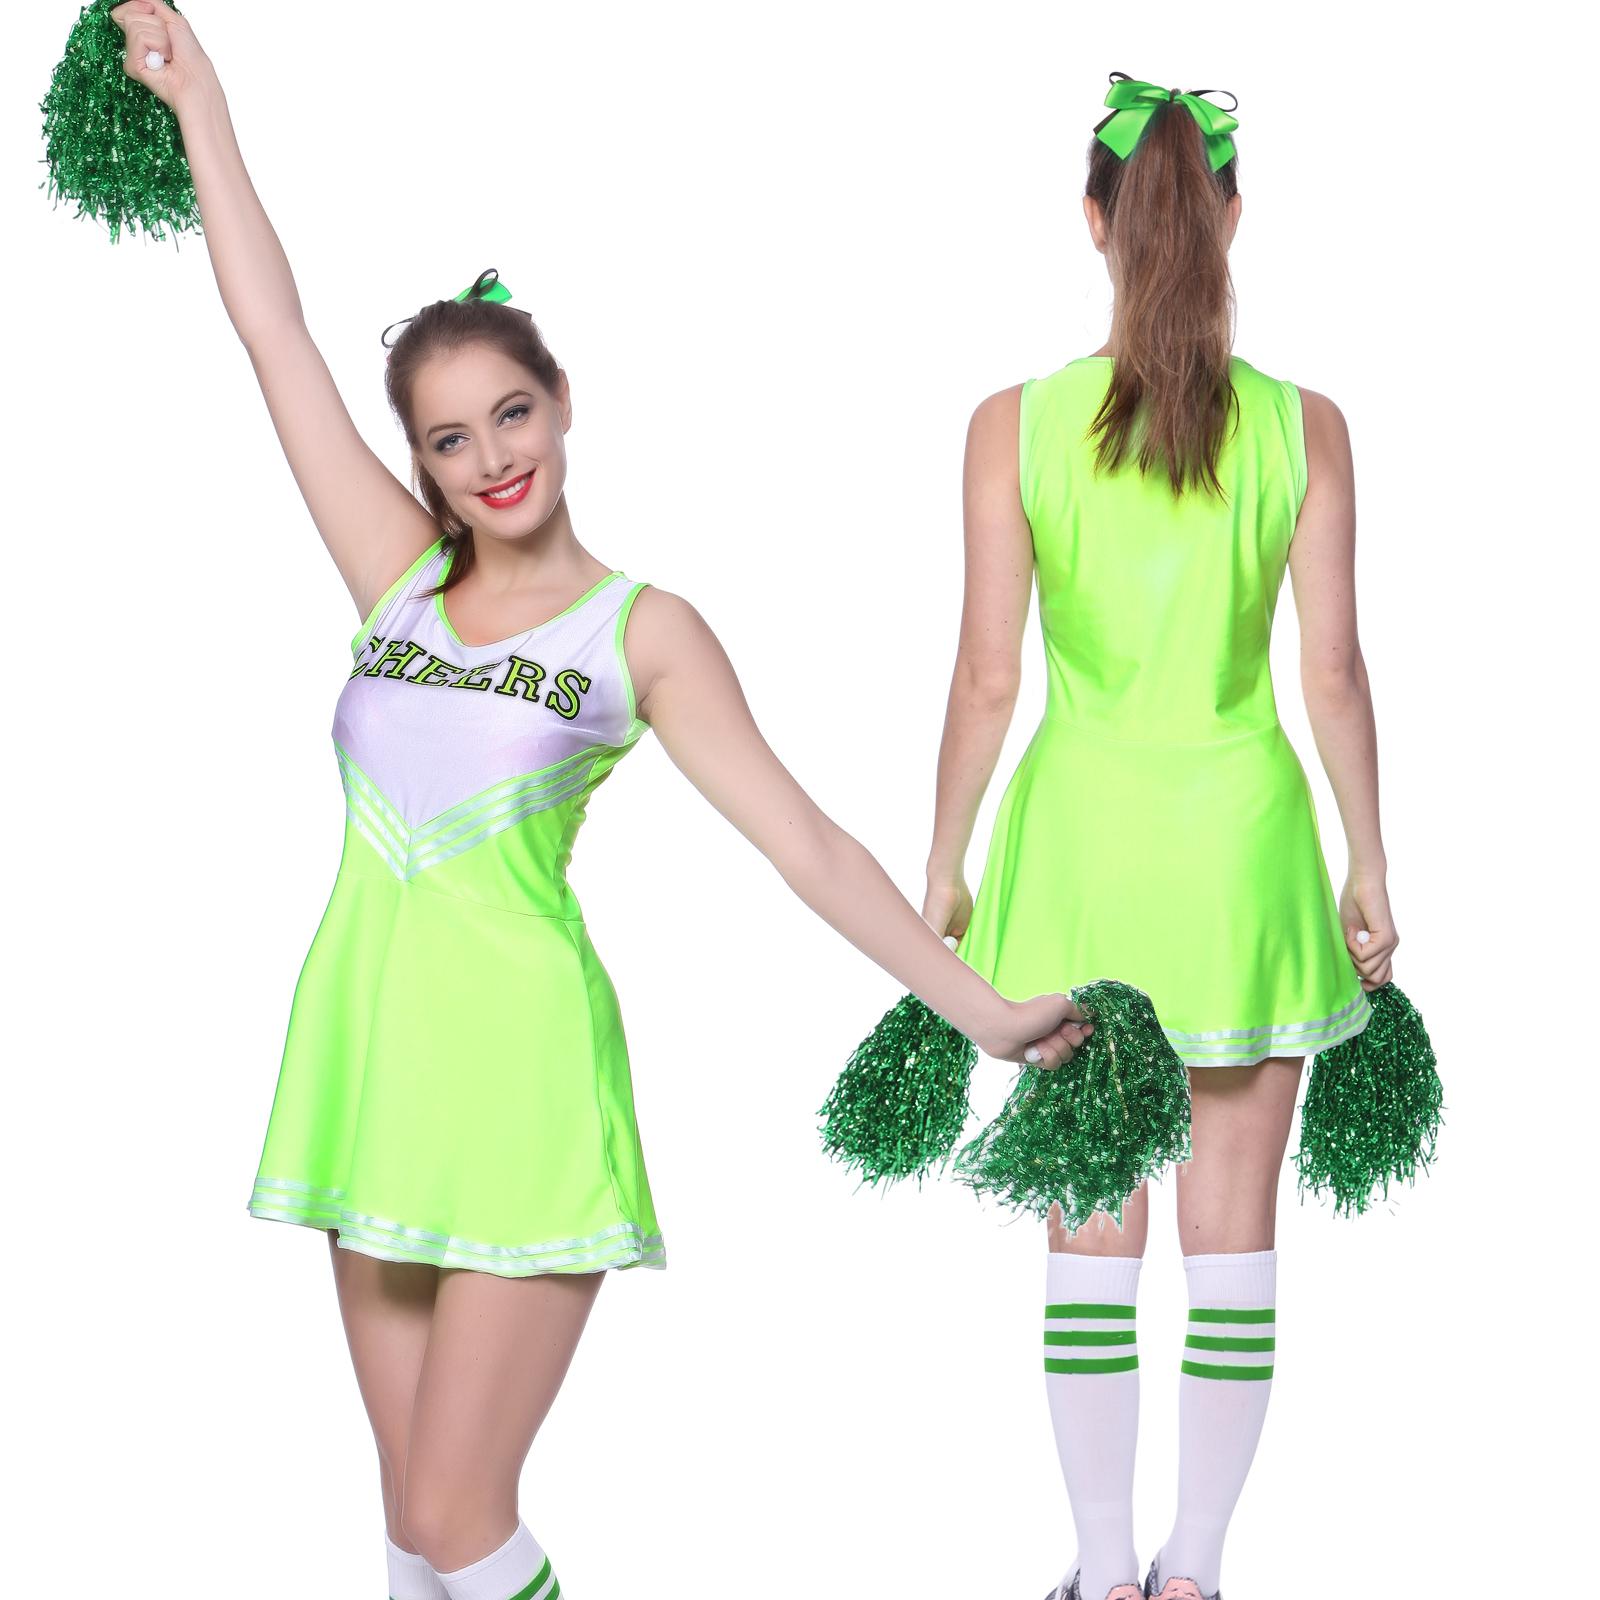 Poms Uniform 13